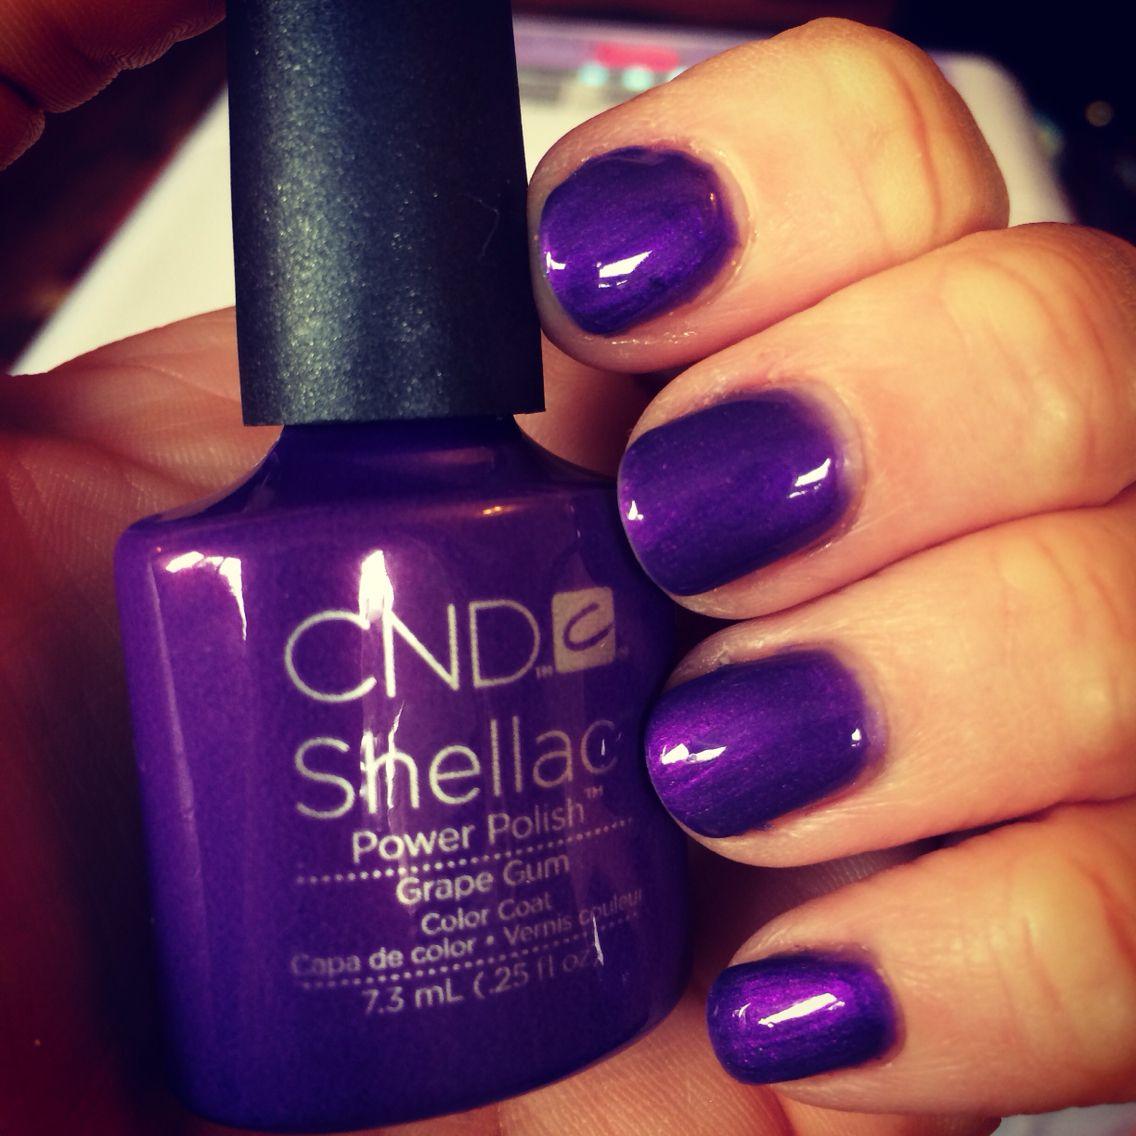 Cnd Shellac Grape Gum Nails Shellac Nails Cnd Shellac Nails